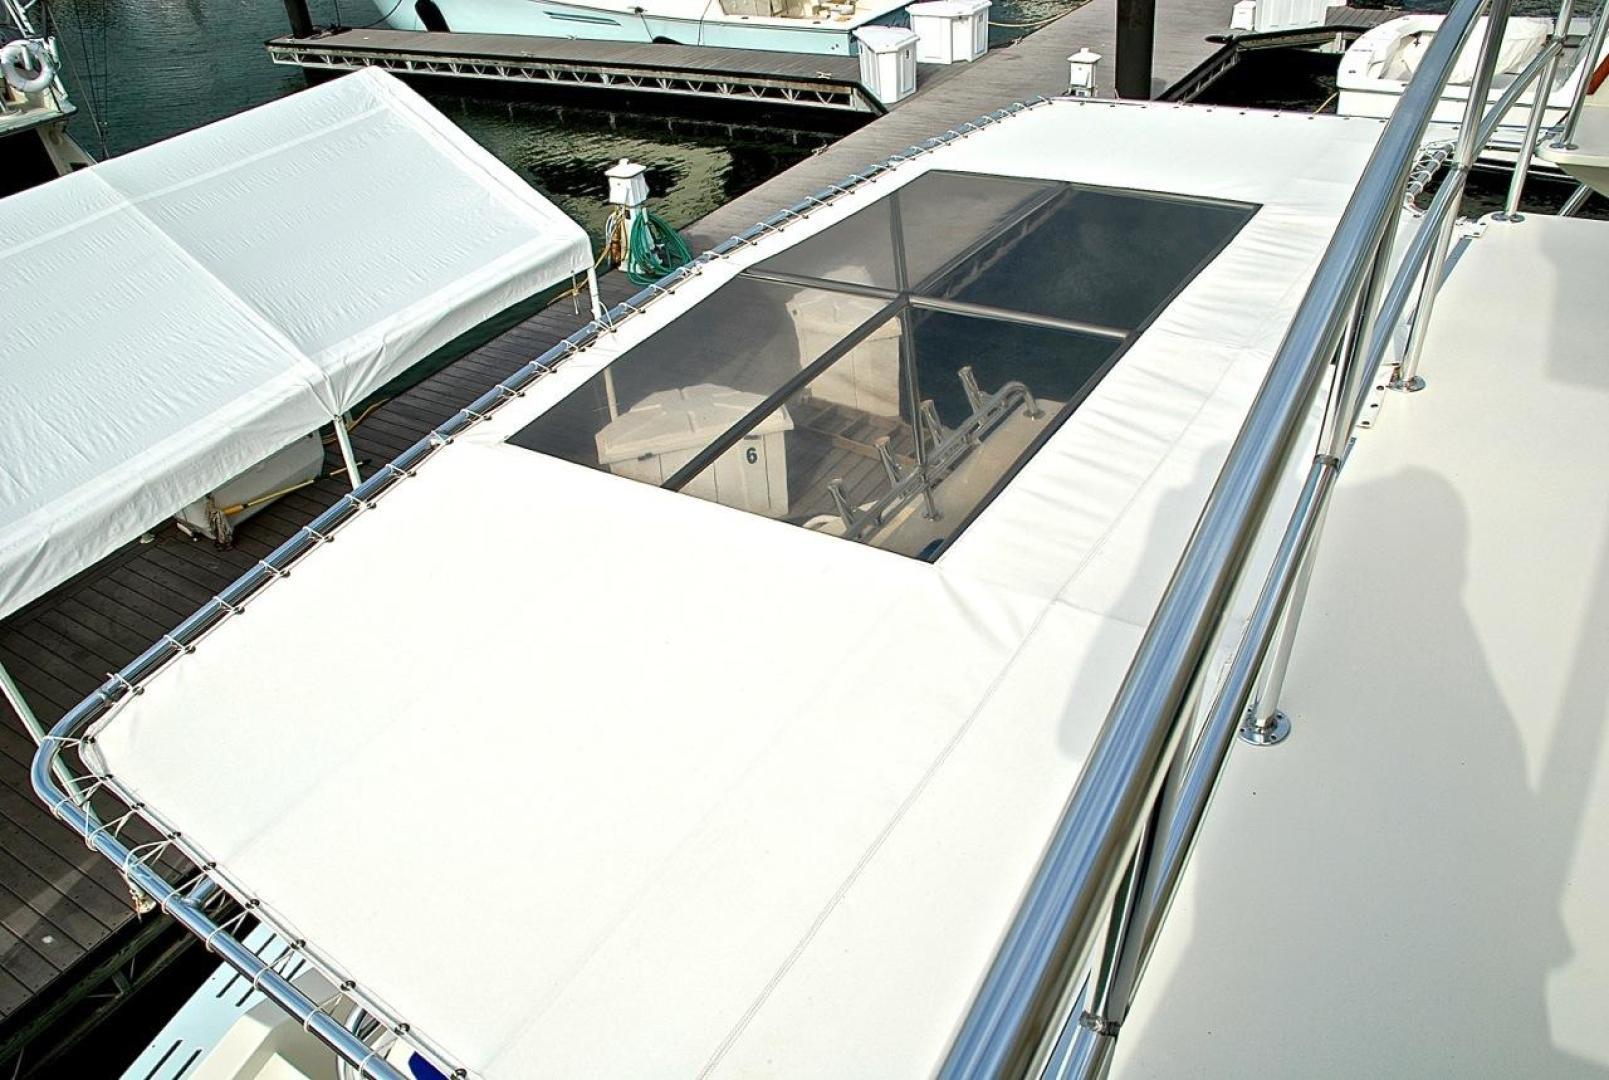 Infinity-Cockpit Motor Yacht 2001-Dont Matter Houston-Texas-United States-Bimini Sun Shade Upper View-1005568 | Thumbnail